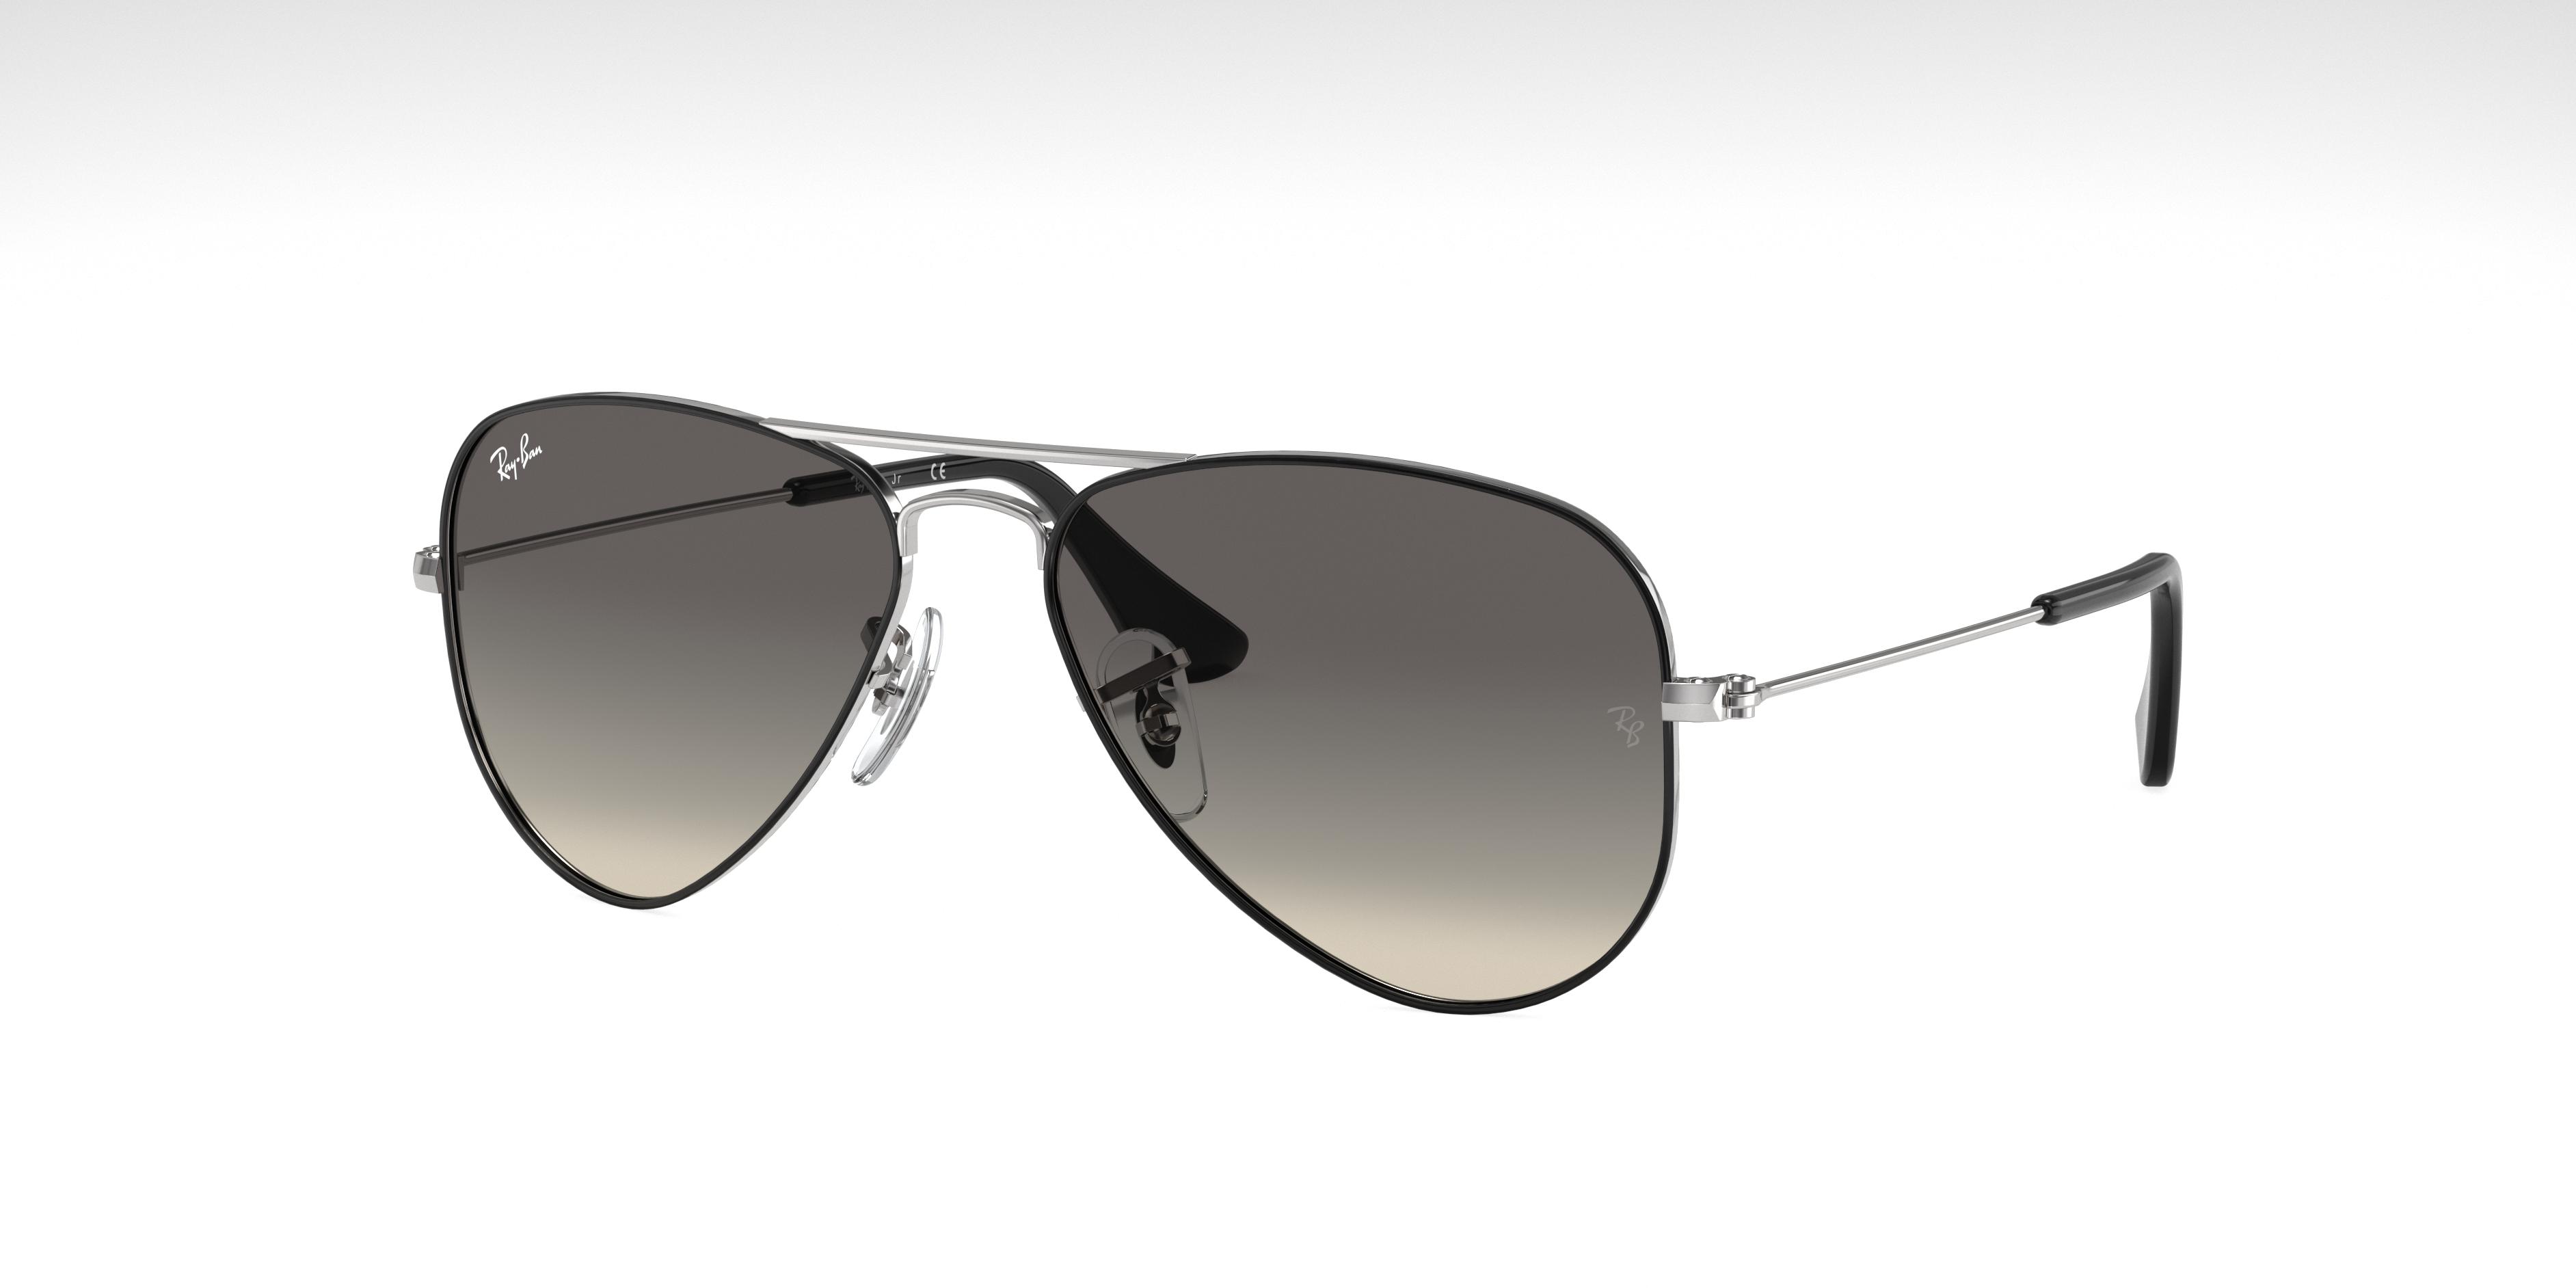 Ray-Ban Aviator Junior Silver, Gray Lenses - RJ9506S